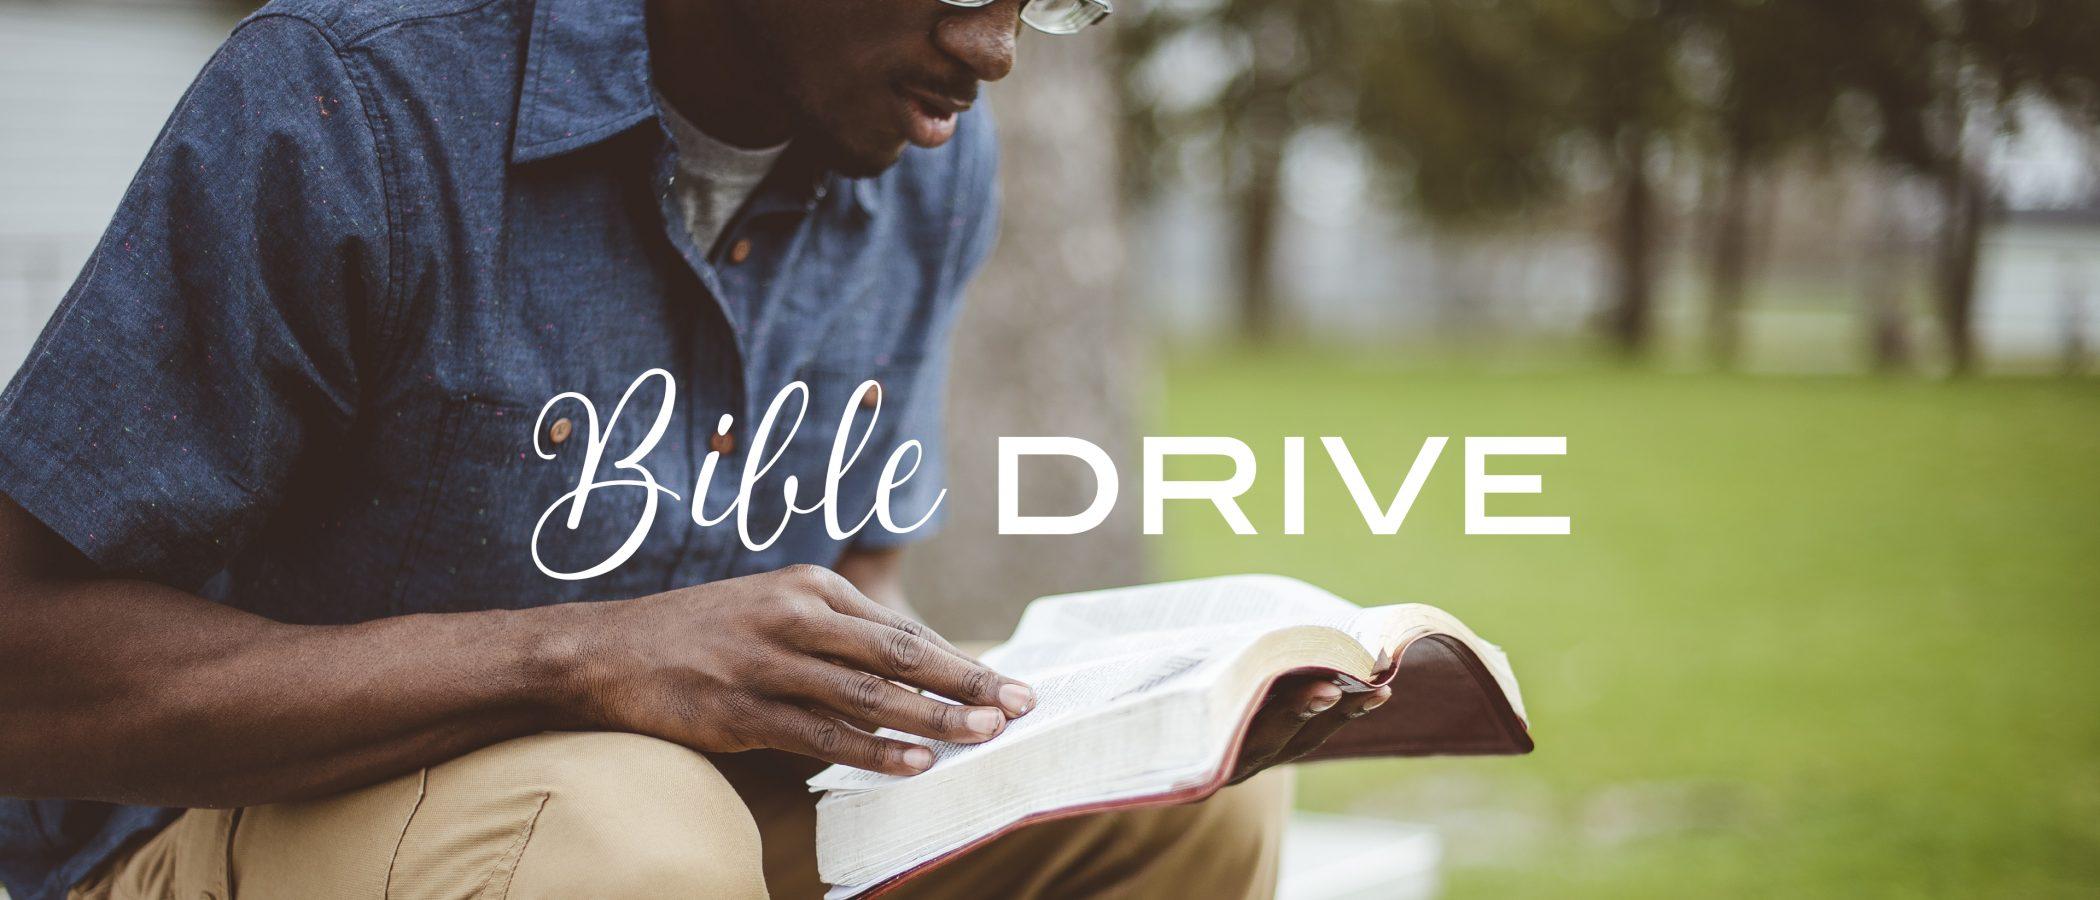 bible-drive-11brd-dq2021-web-banner2x-100